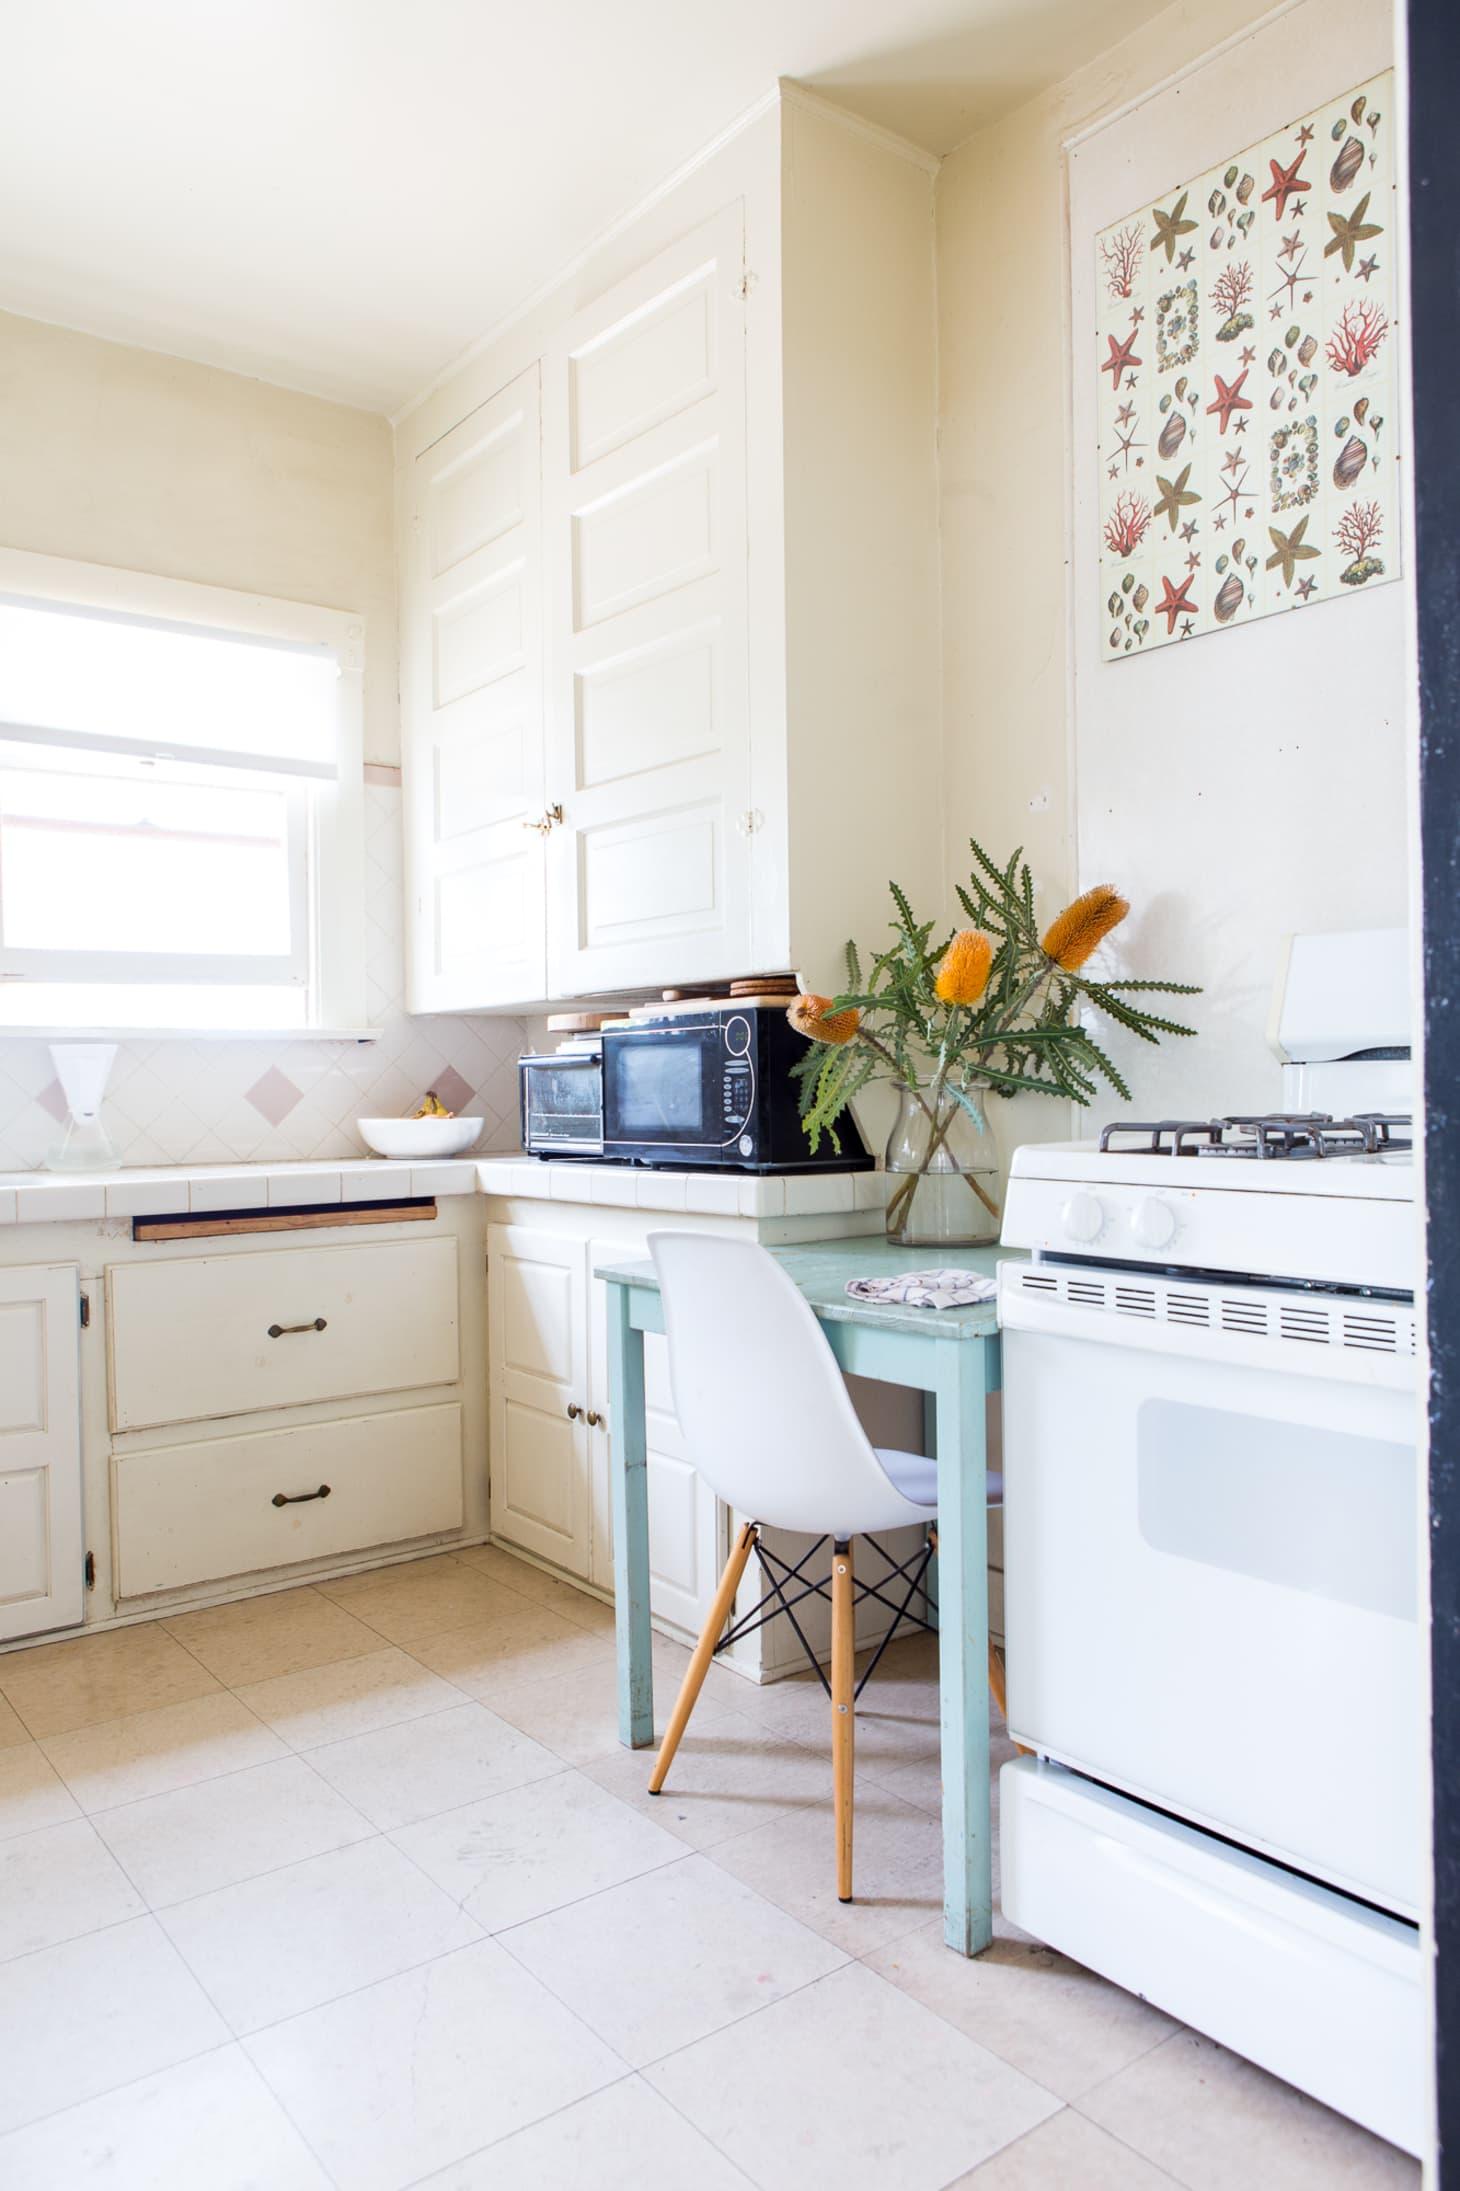 Best Small Kitchen Design Ideas Smart Small Kitchen Solutions